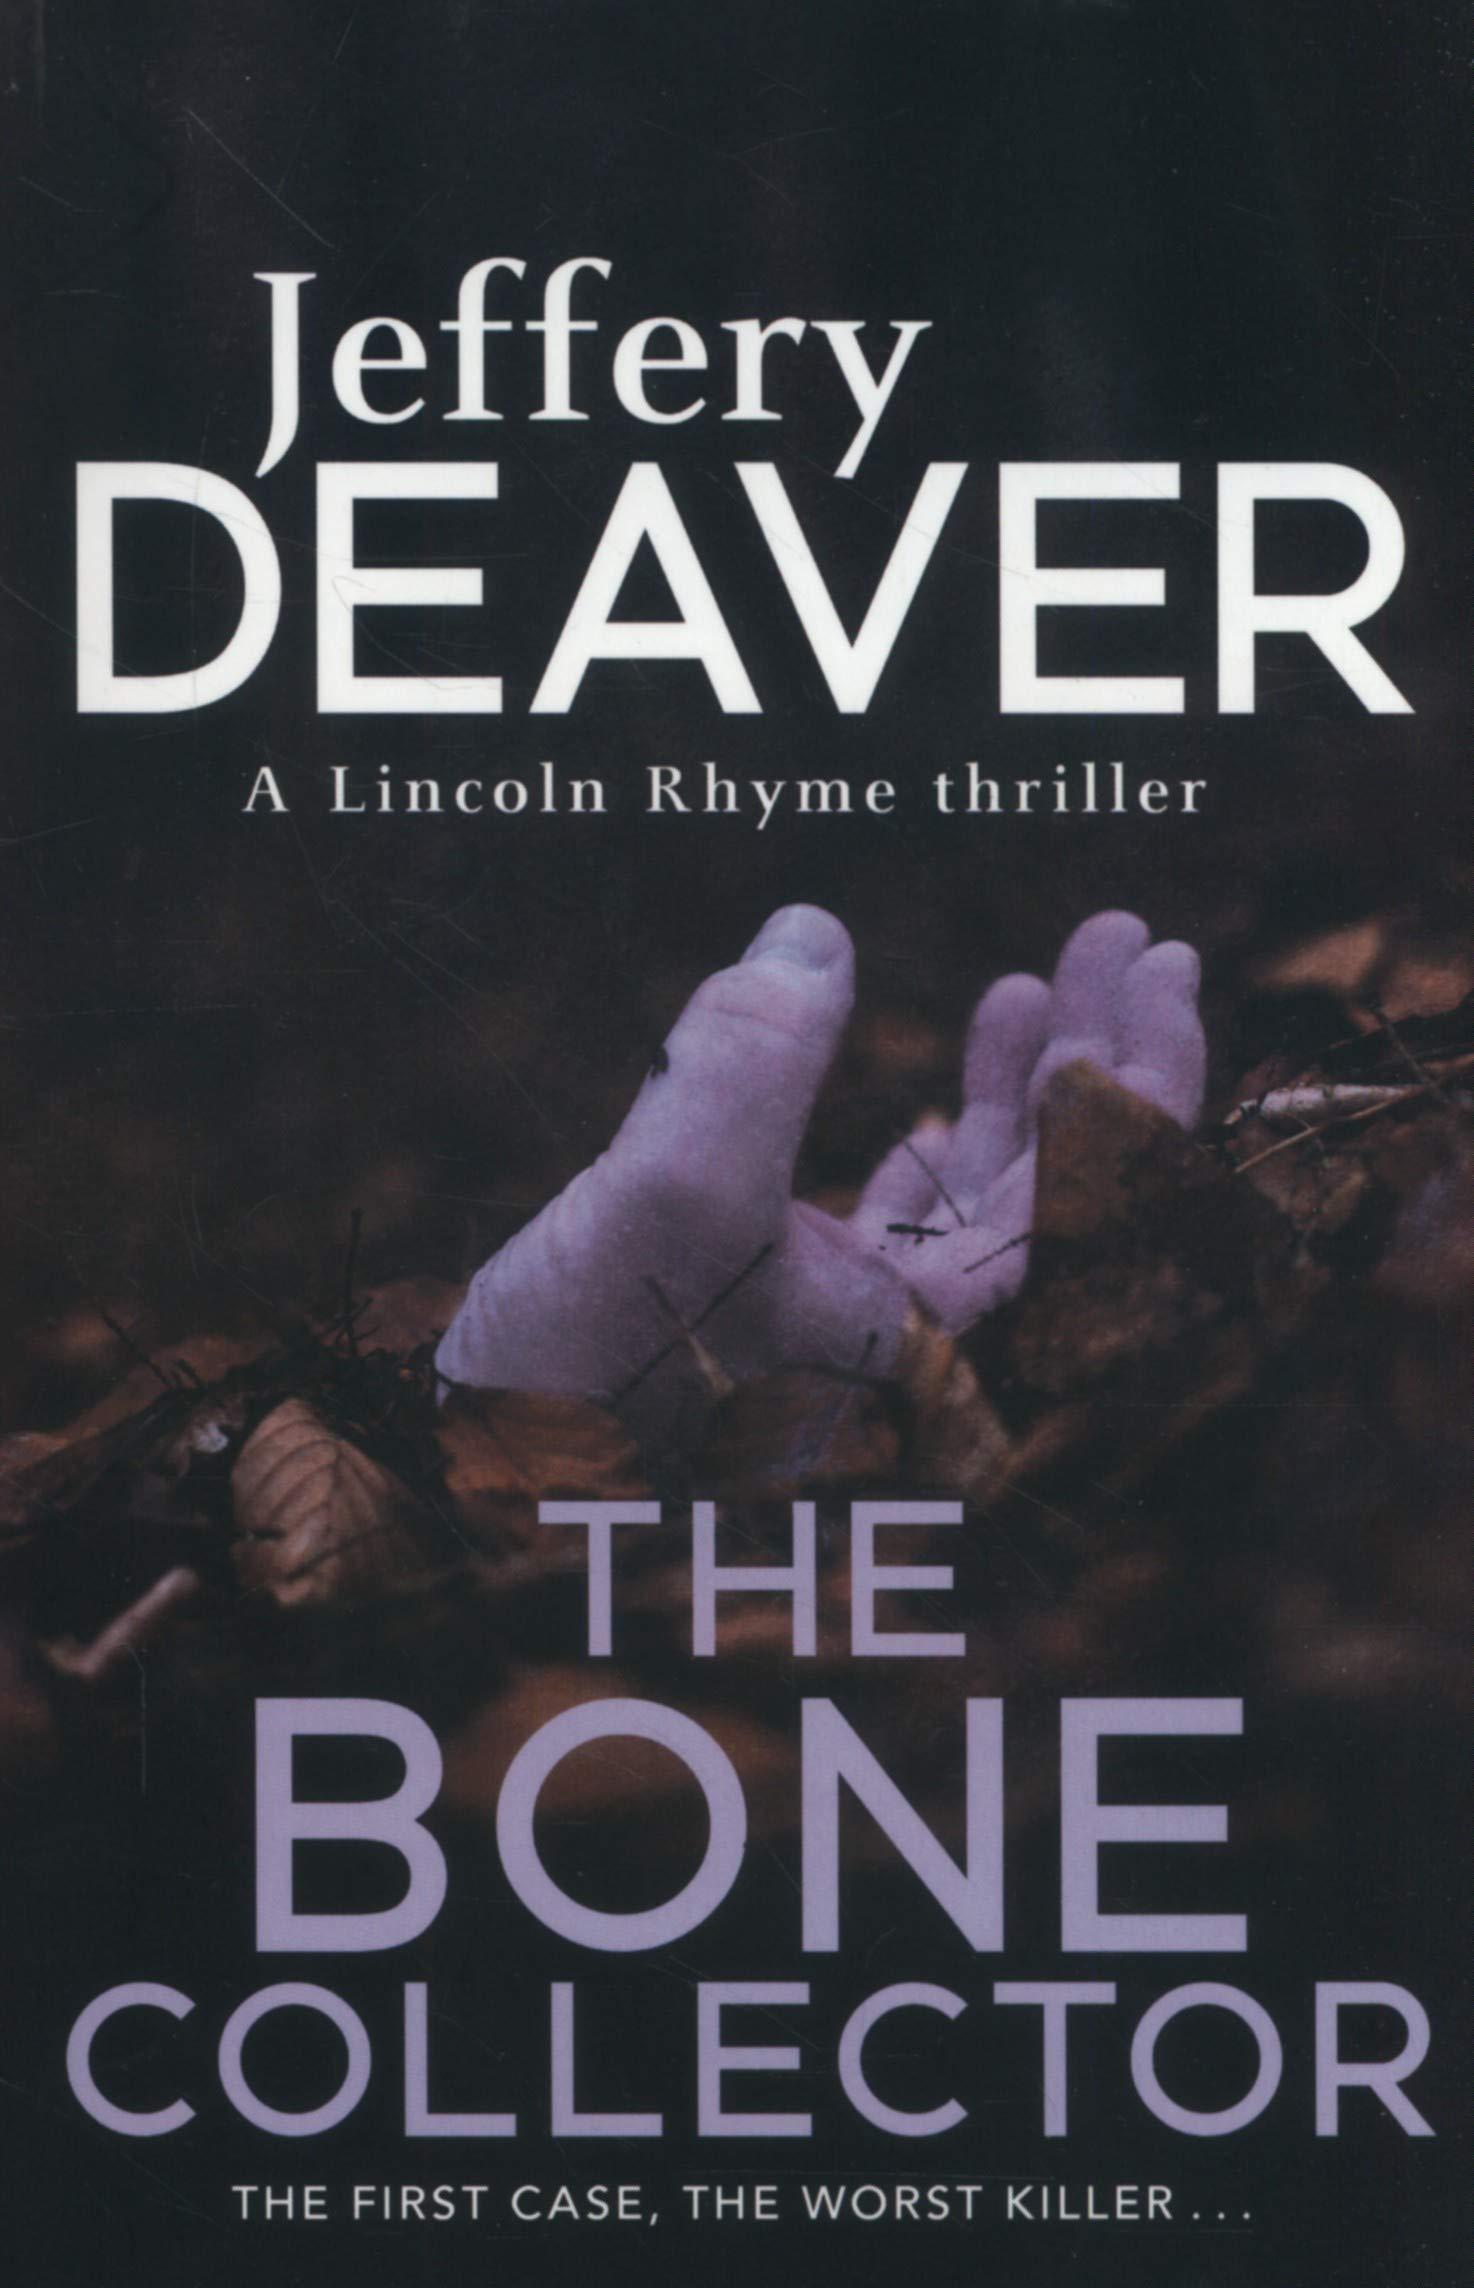 bone collector movie download free